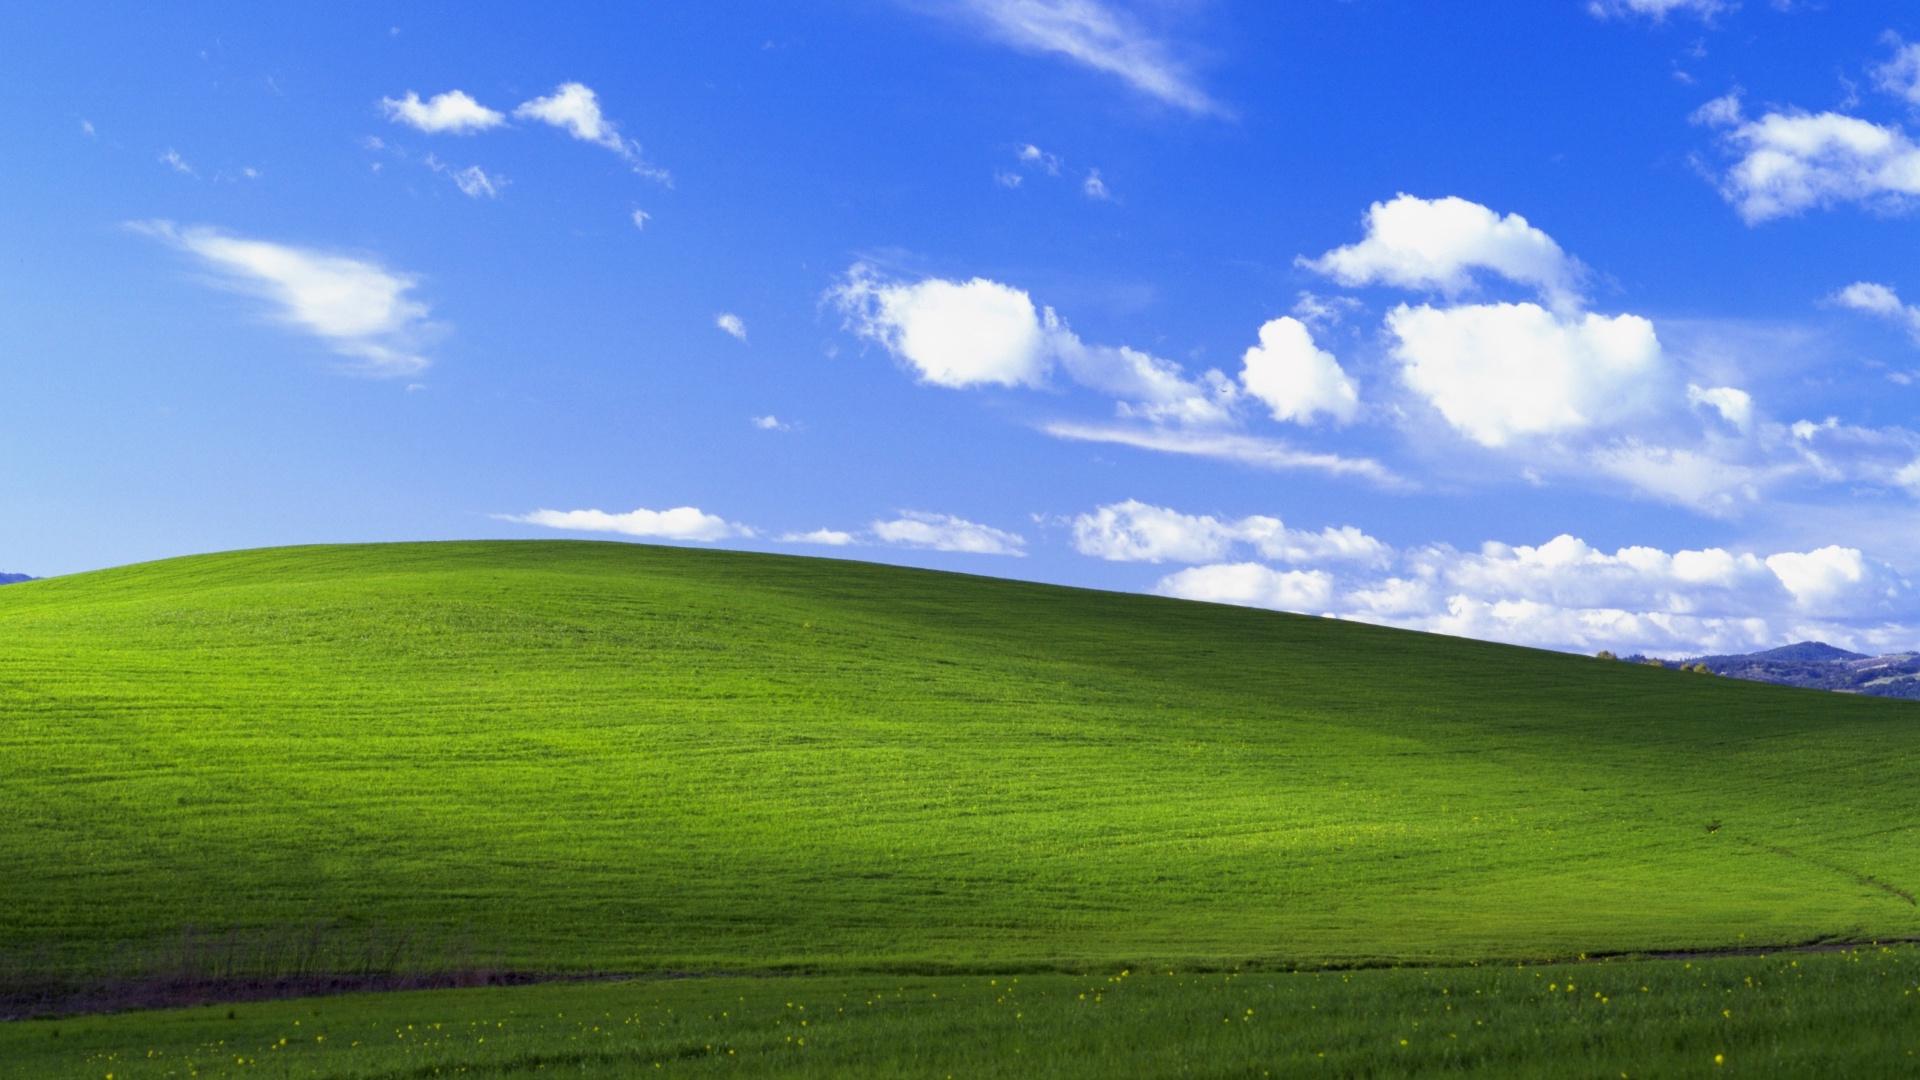 Windows XP Wallpaper 1920x1080 Windows XP 1920x1080